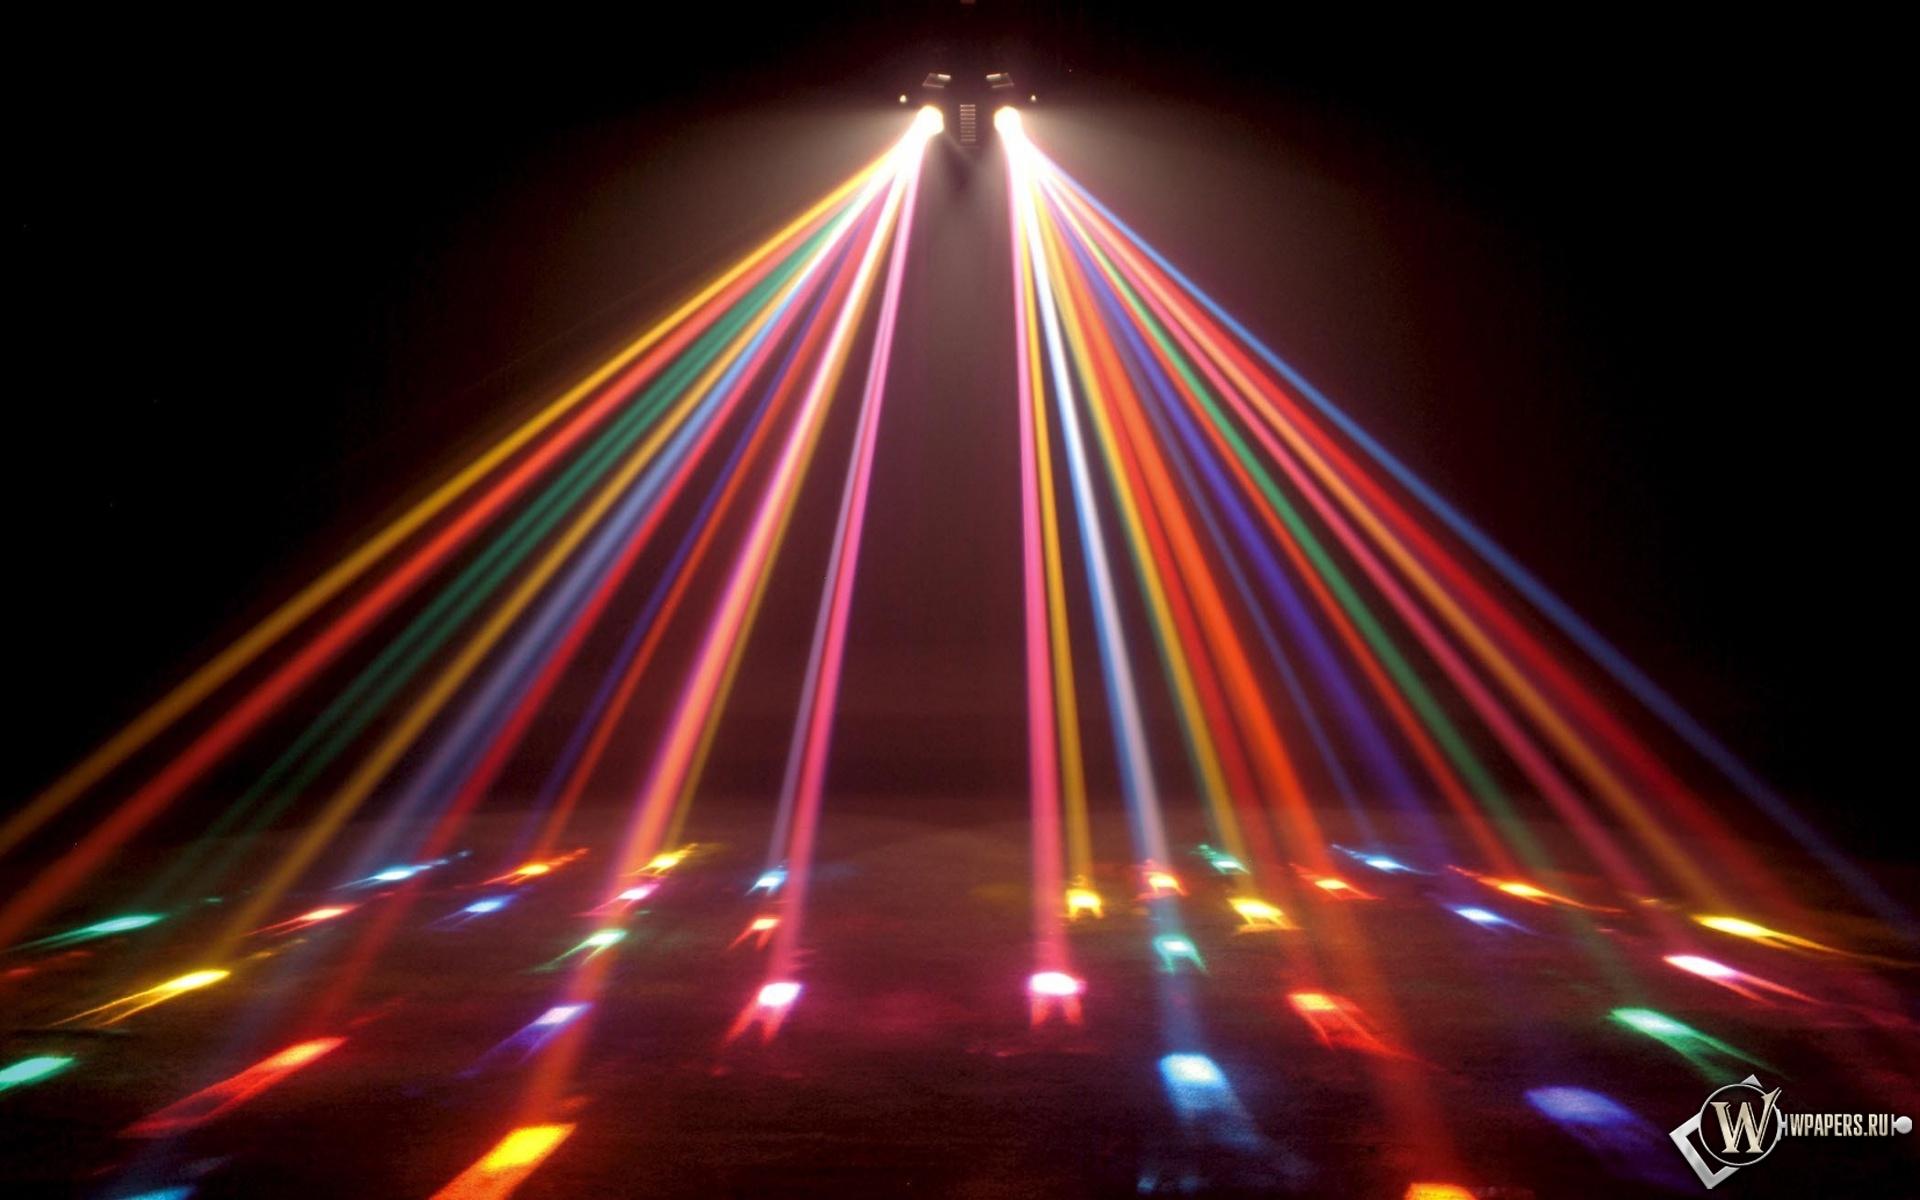 http://wpapers.ru/wallpapers/Music/14202/1920x1200_Disco-Lights.jpg